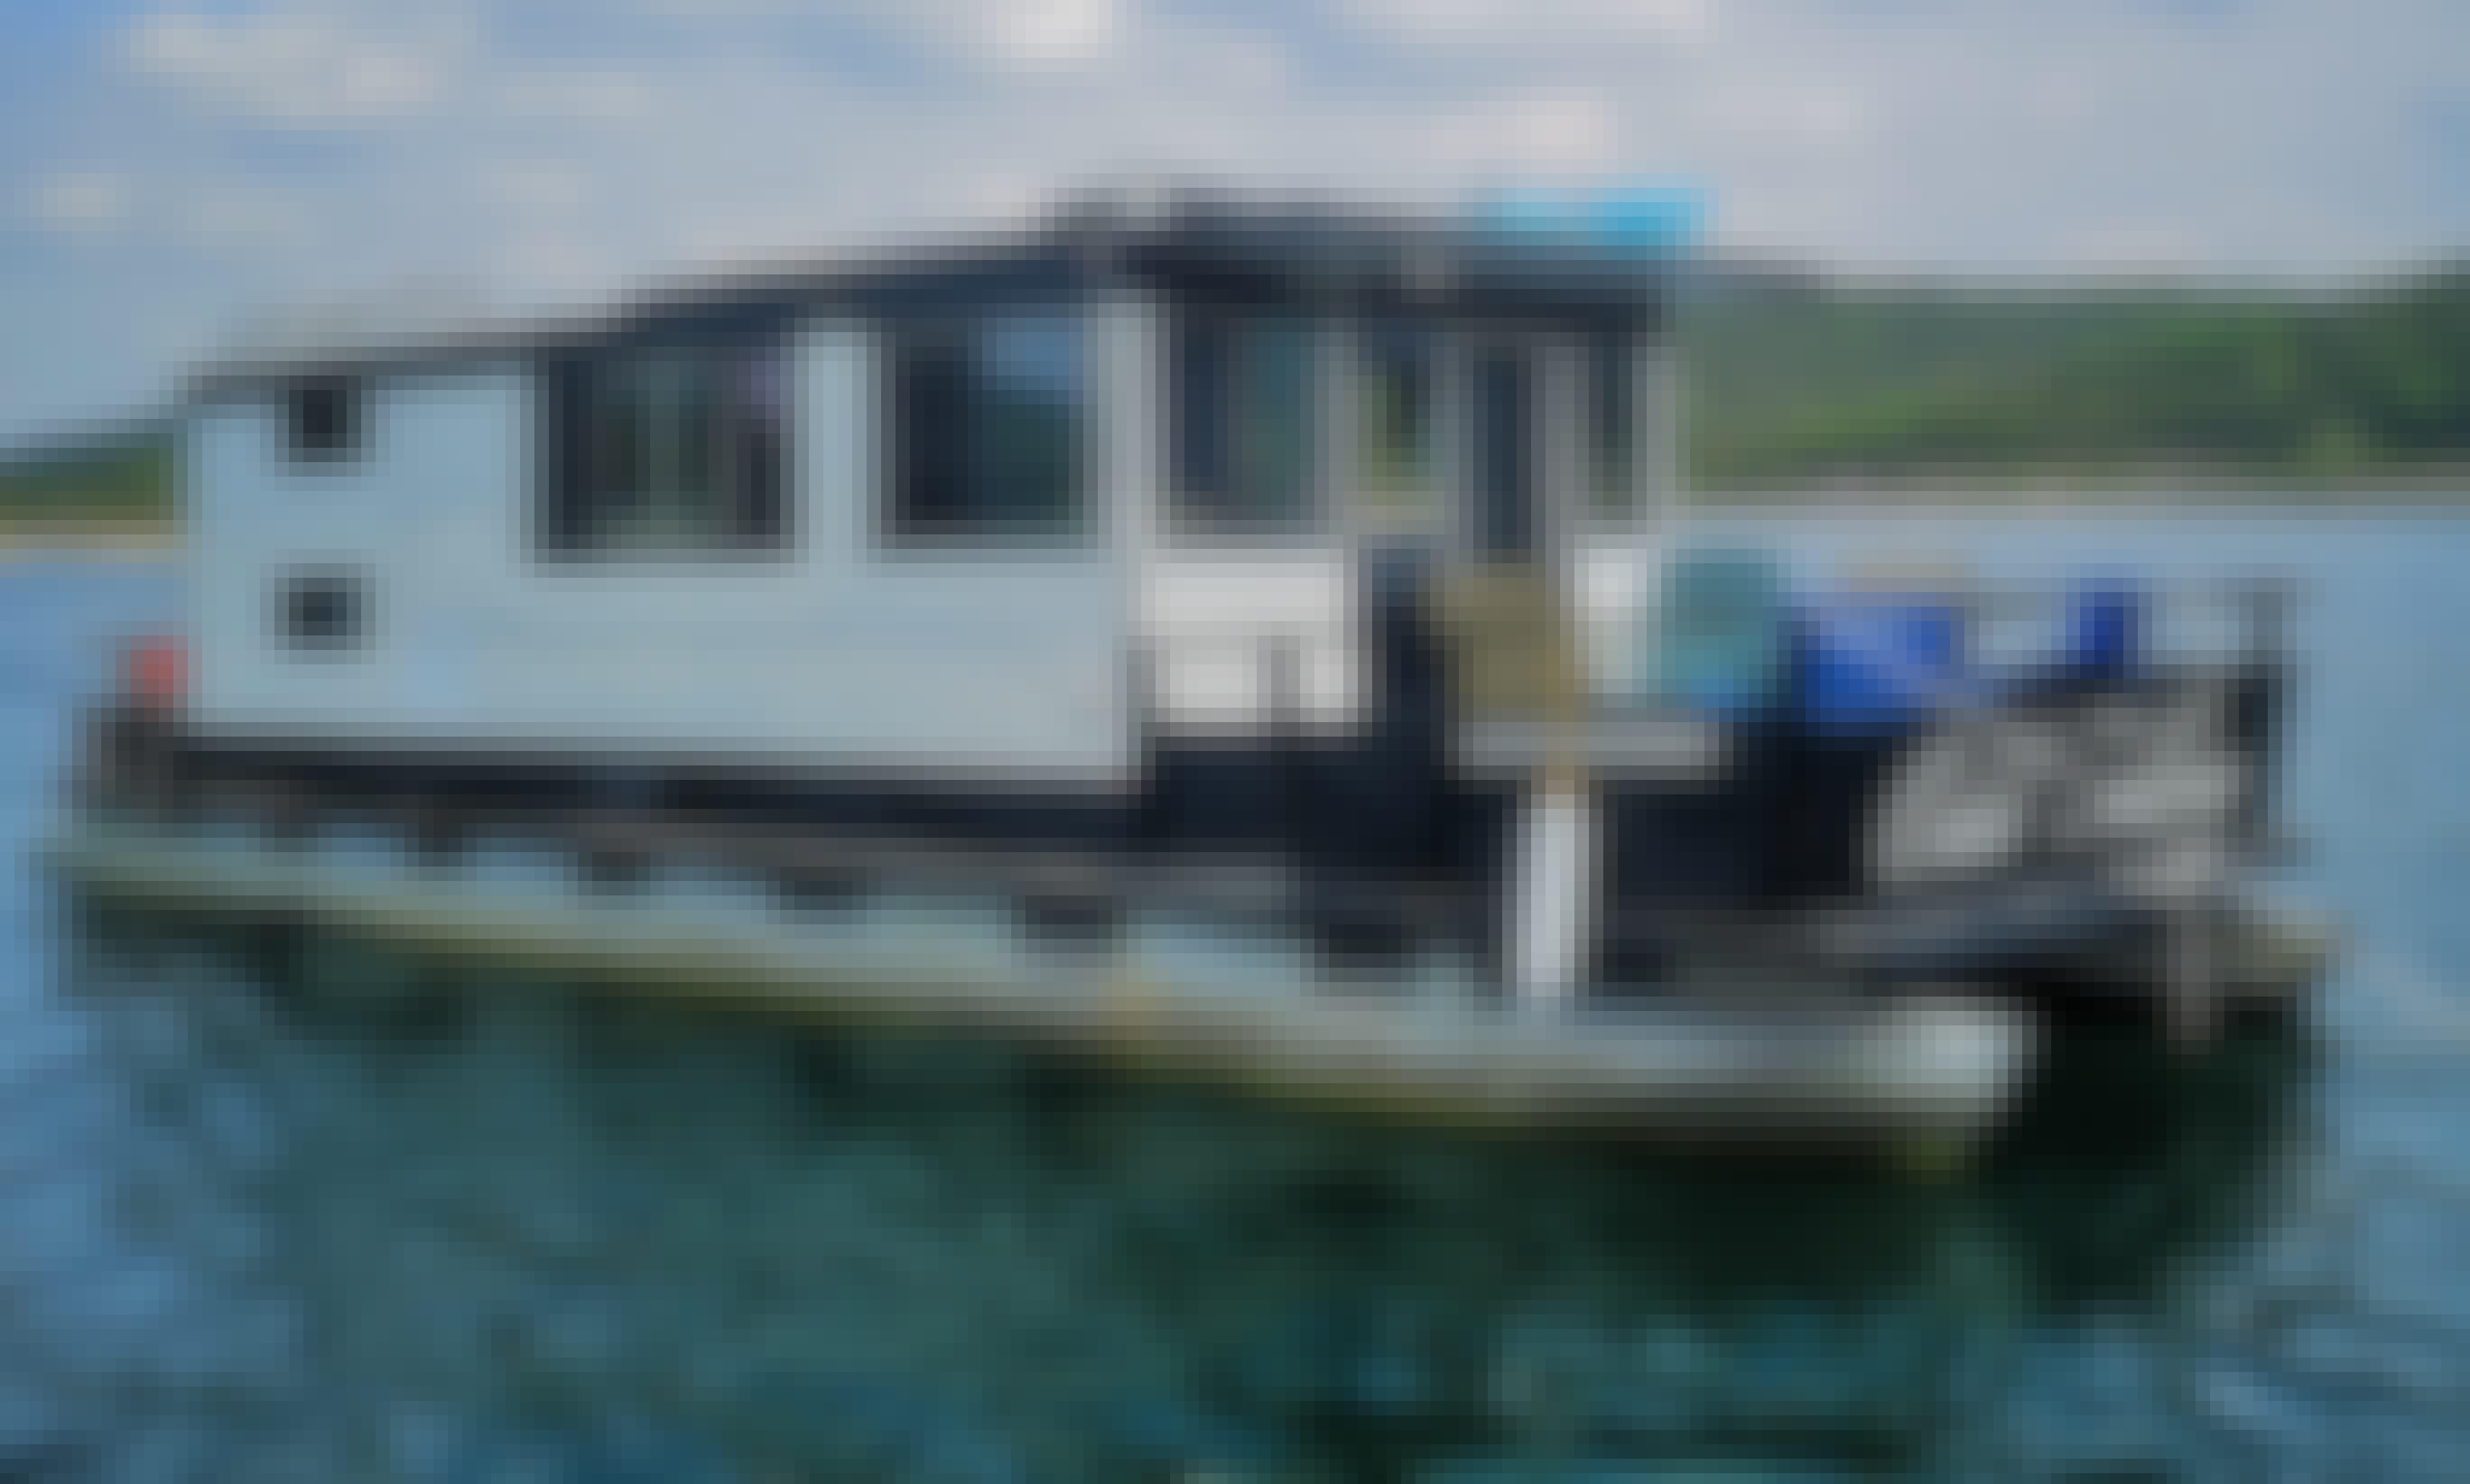 35' Custom Houseboat! Cruise Lake Travis to Hippy Hollow, Cypress Creek cove or Devils Cove